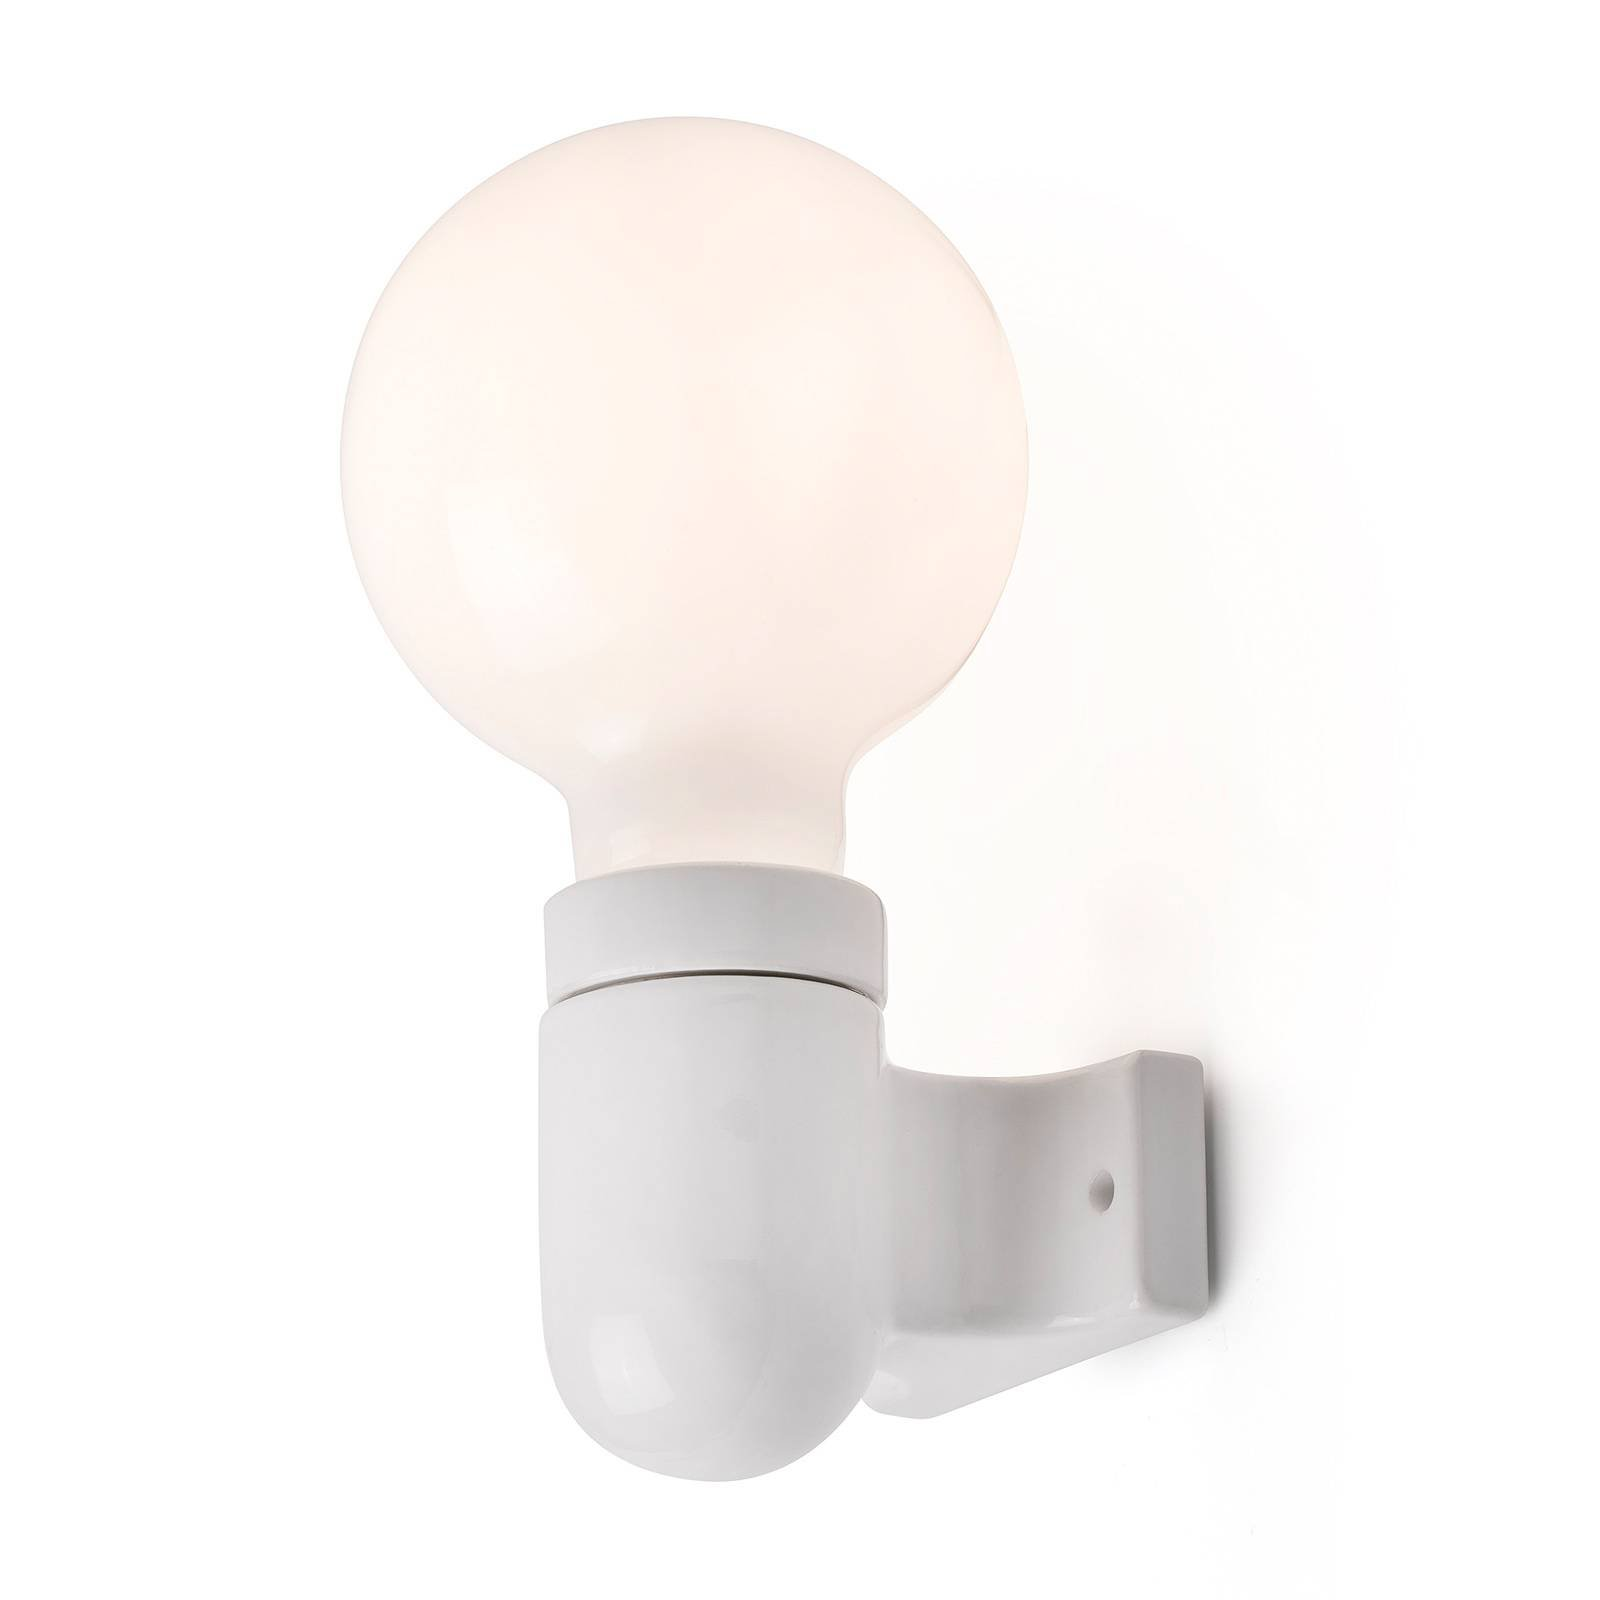 Vegglampe Sera, hvit